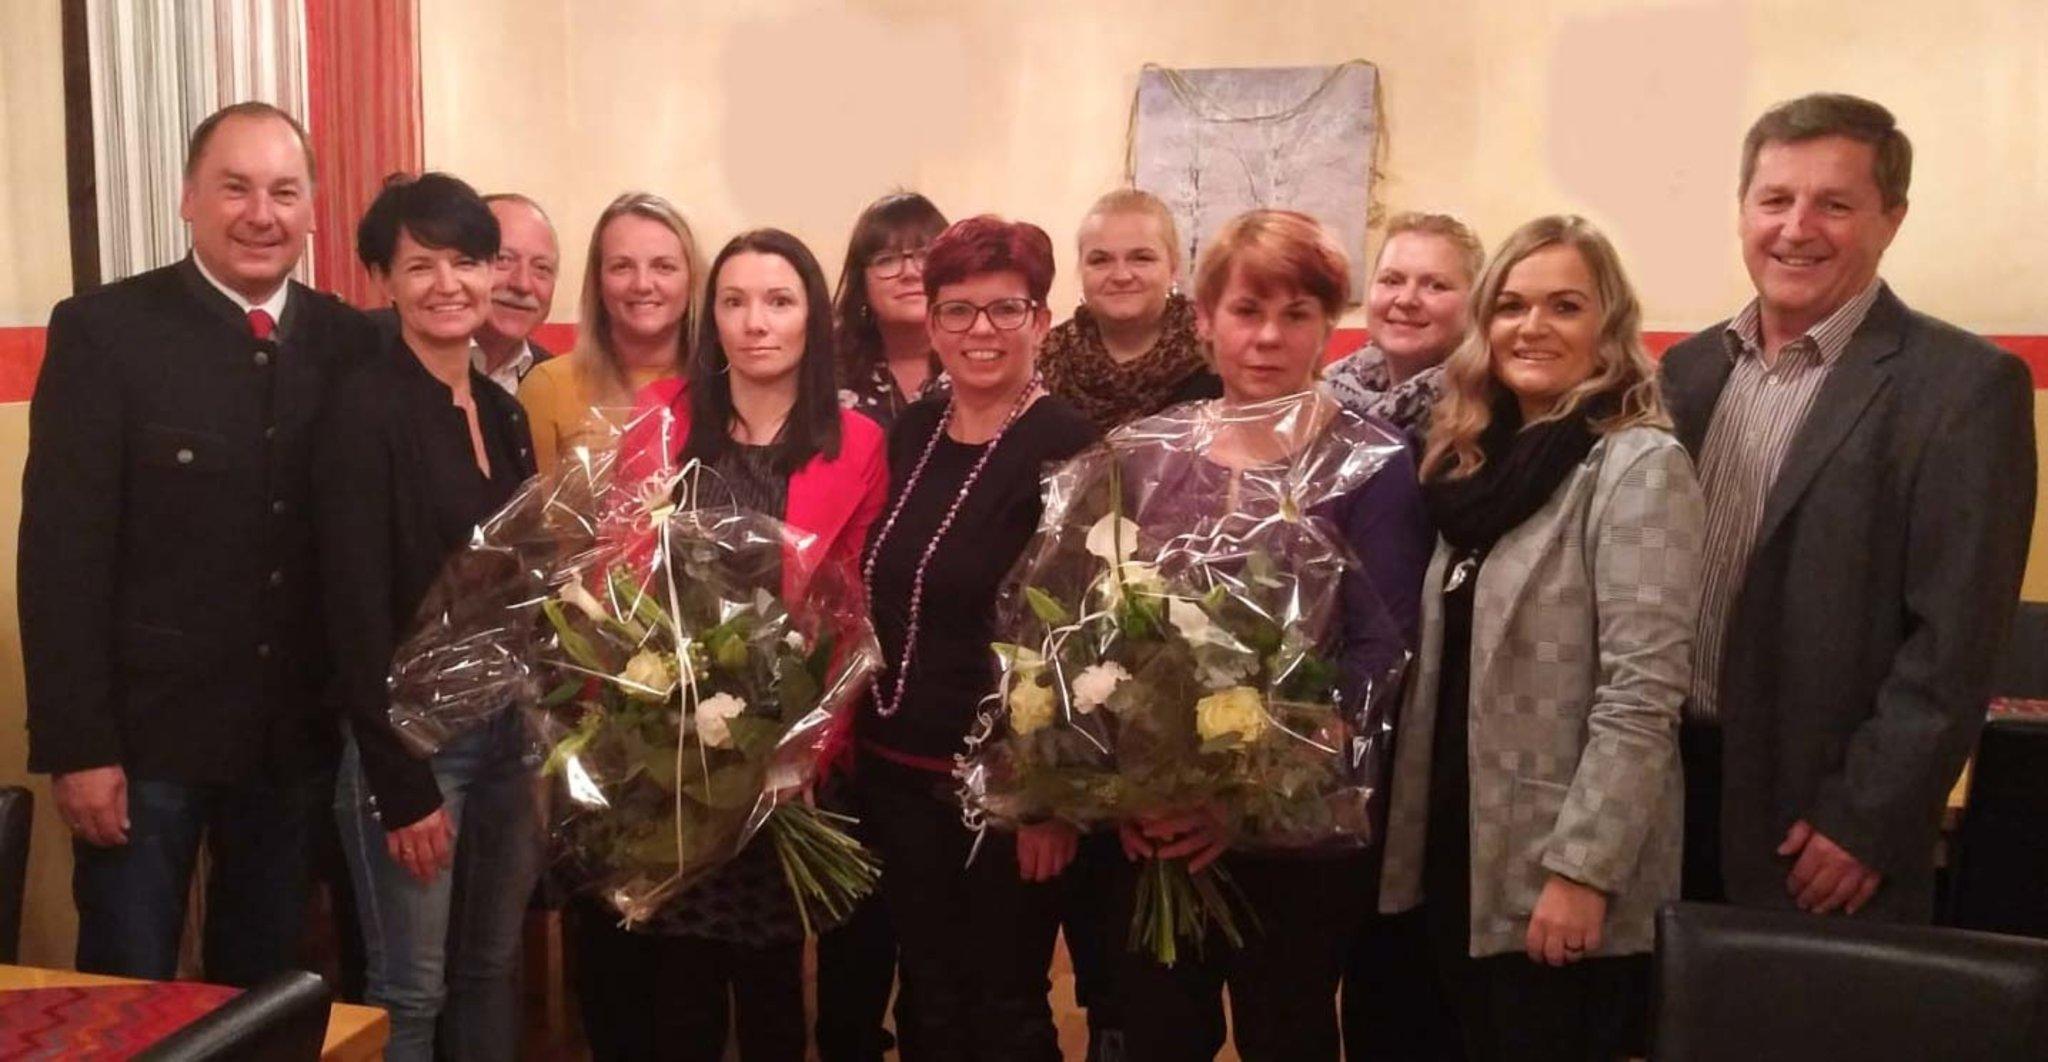 Brnbach single frauen: Wiesing singles aus kostenlos